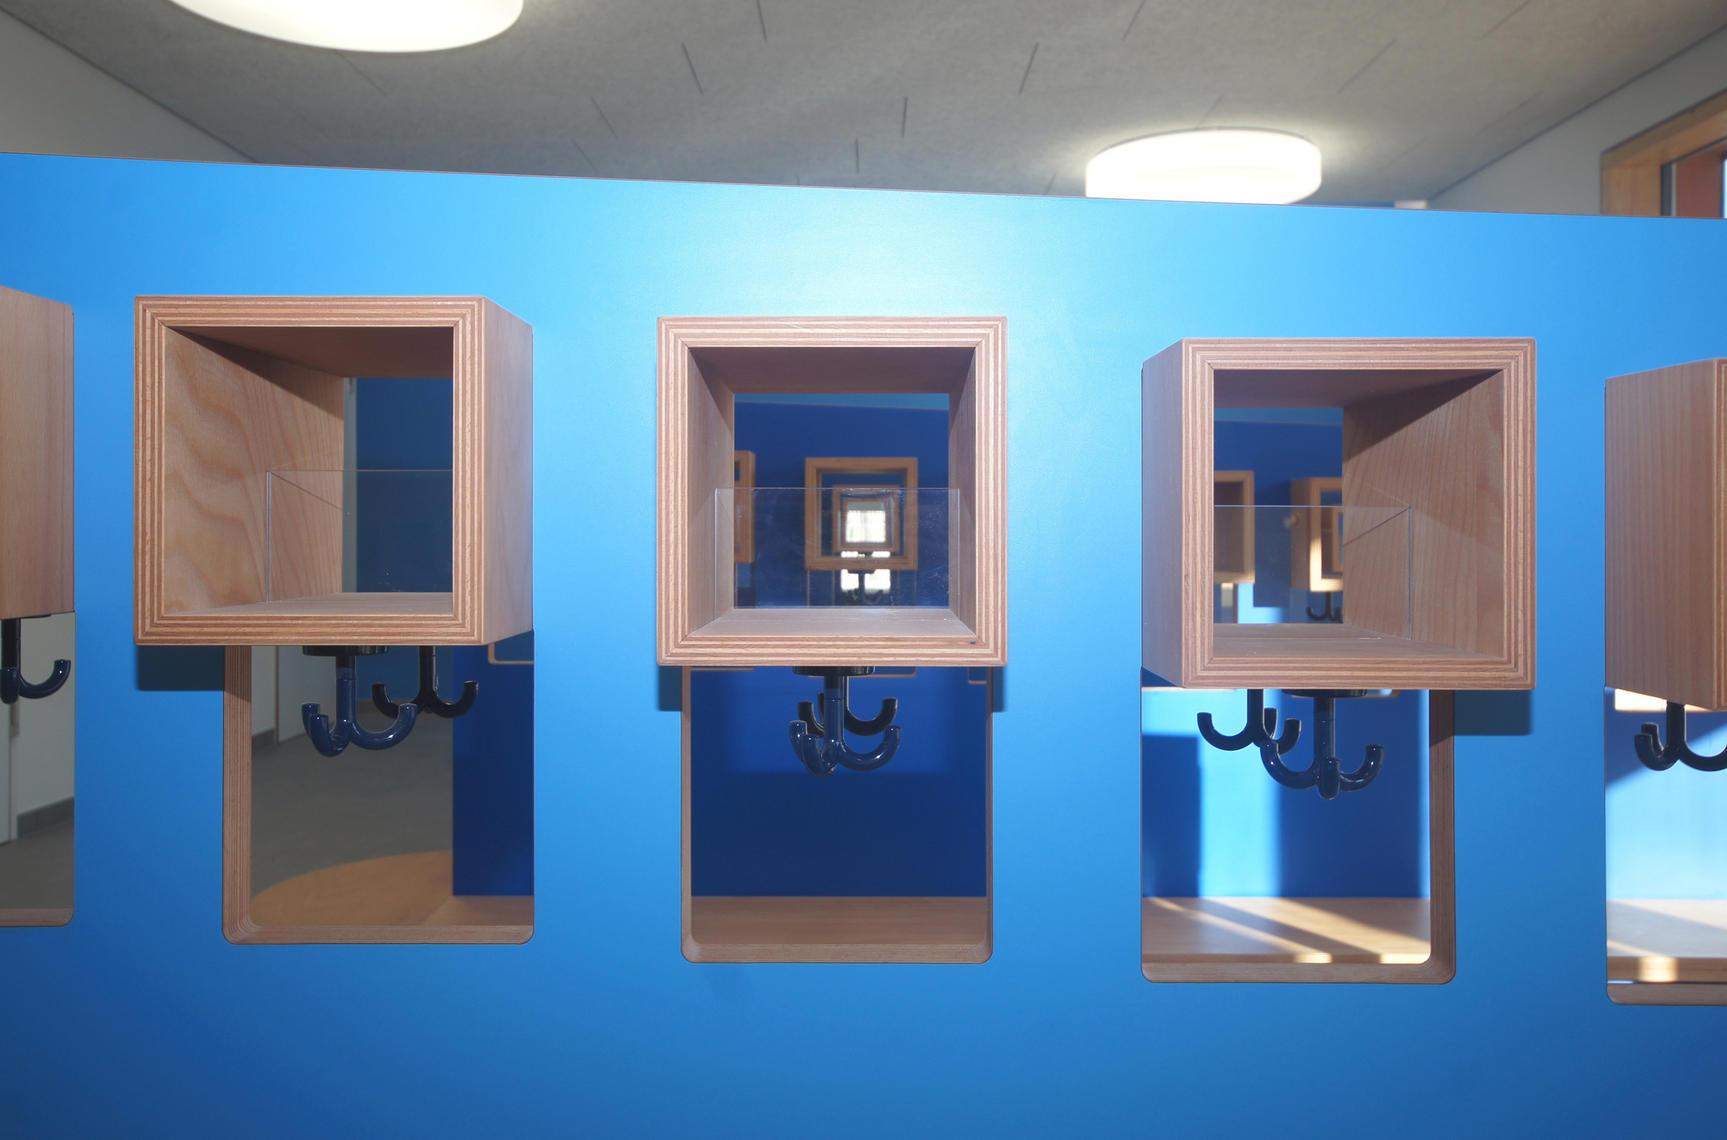 kinderhaus gomaringen orth architektur t bingen. Black Bedroom Furniture Sets. Home Design Ideas